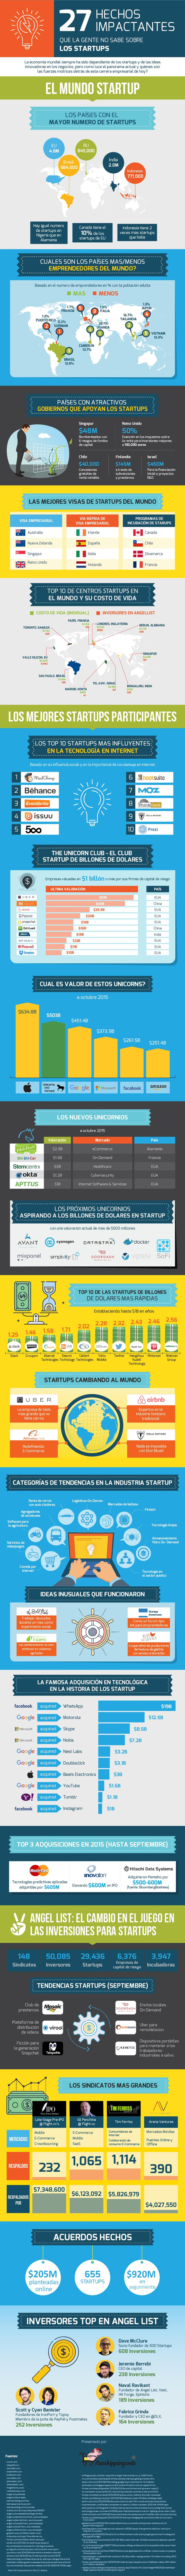 Muy laaarga e interesante infografía sobre 27 hechos impactantes del mundo startup